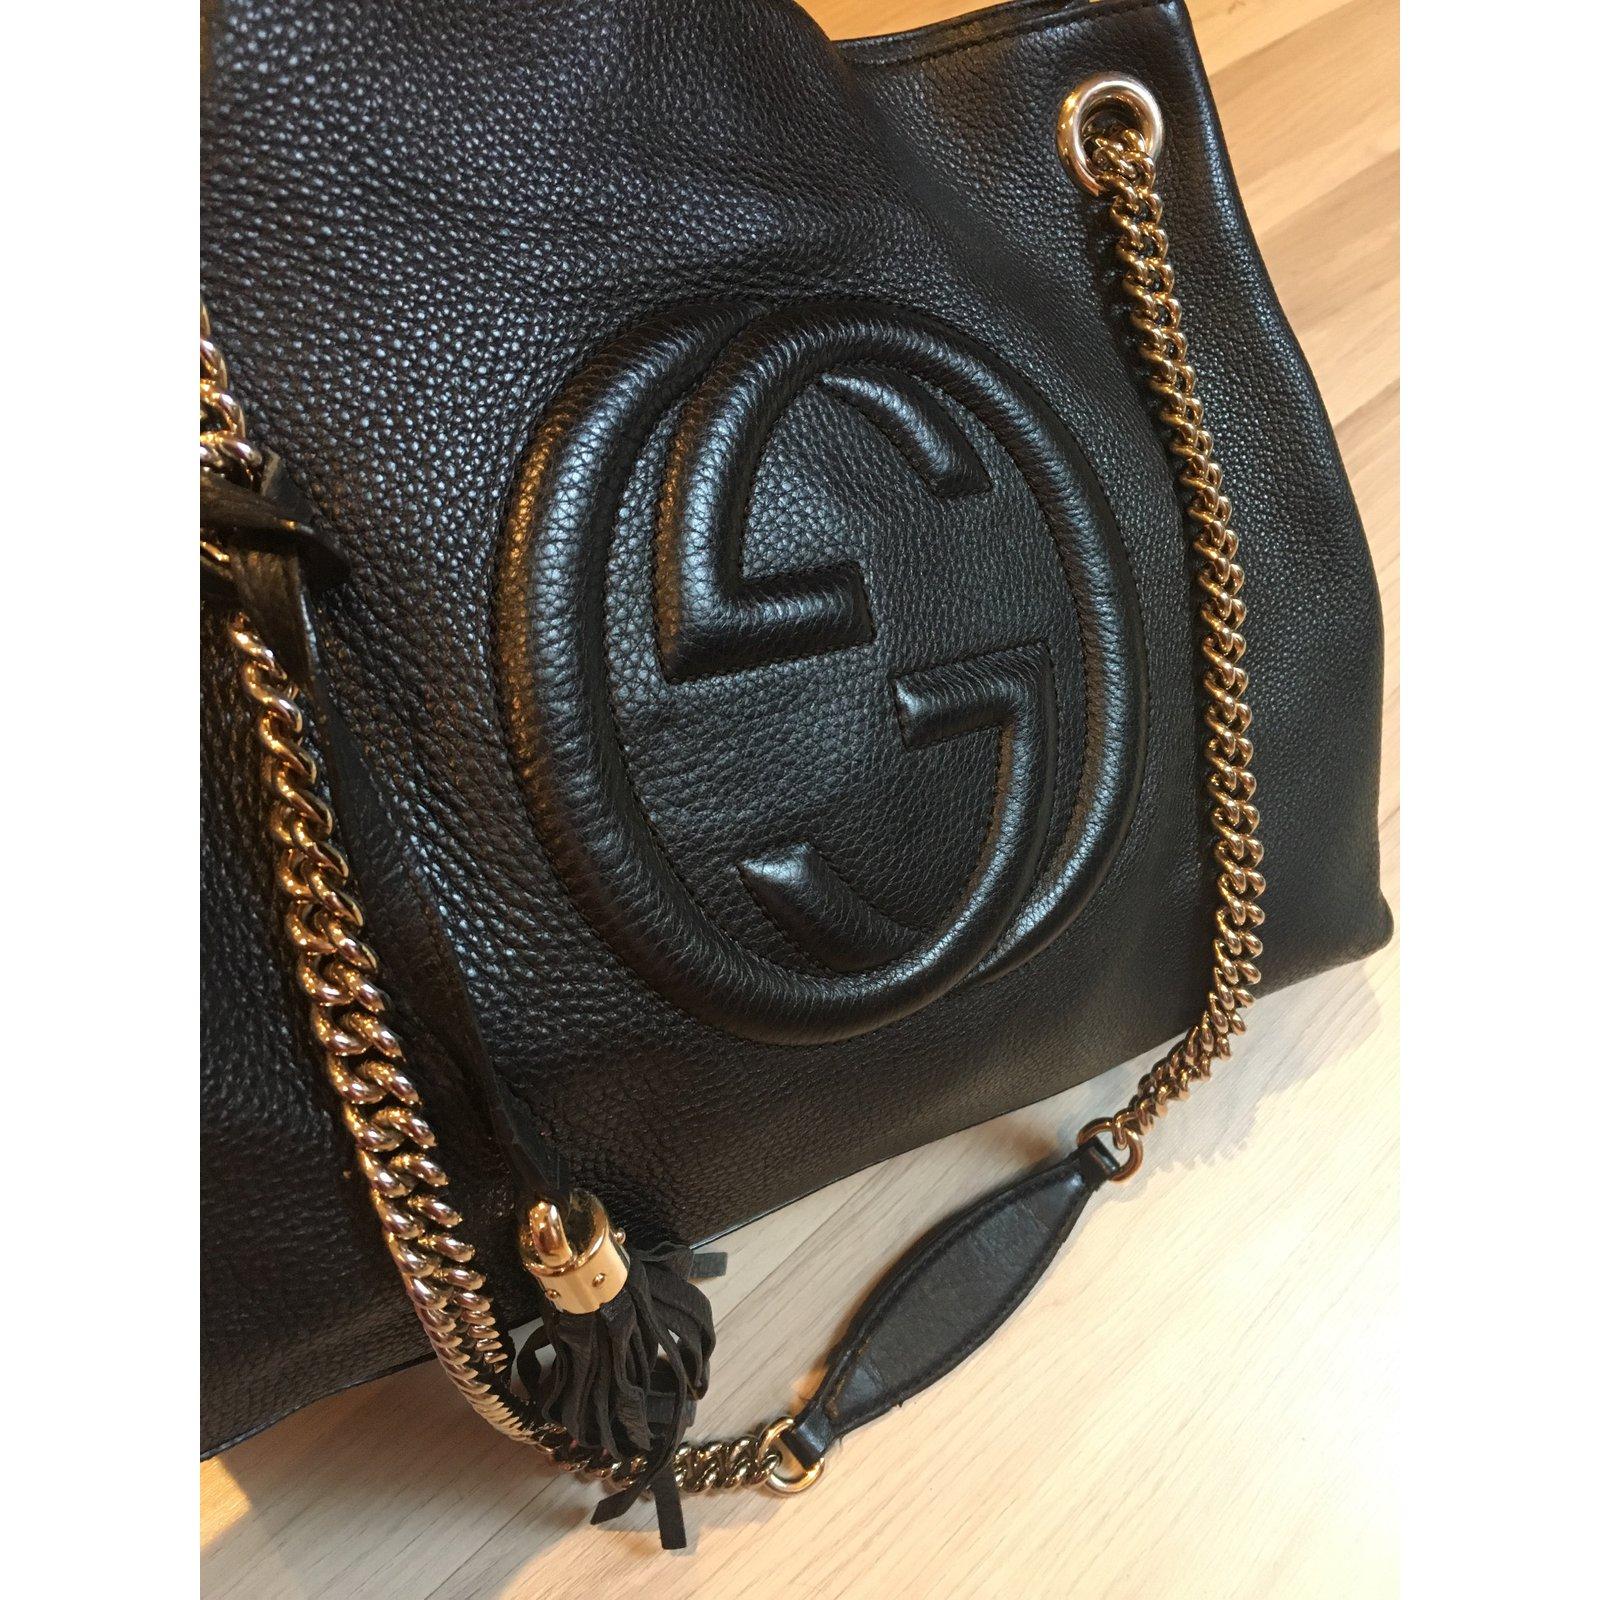 cfd3943f0f02 Gucci Soho Bag Handbags Leather Black ref.70962 - Joli Closet